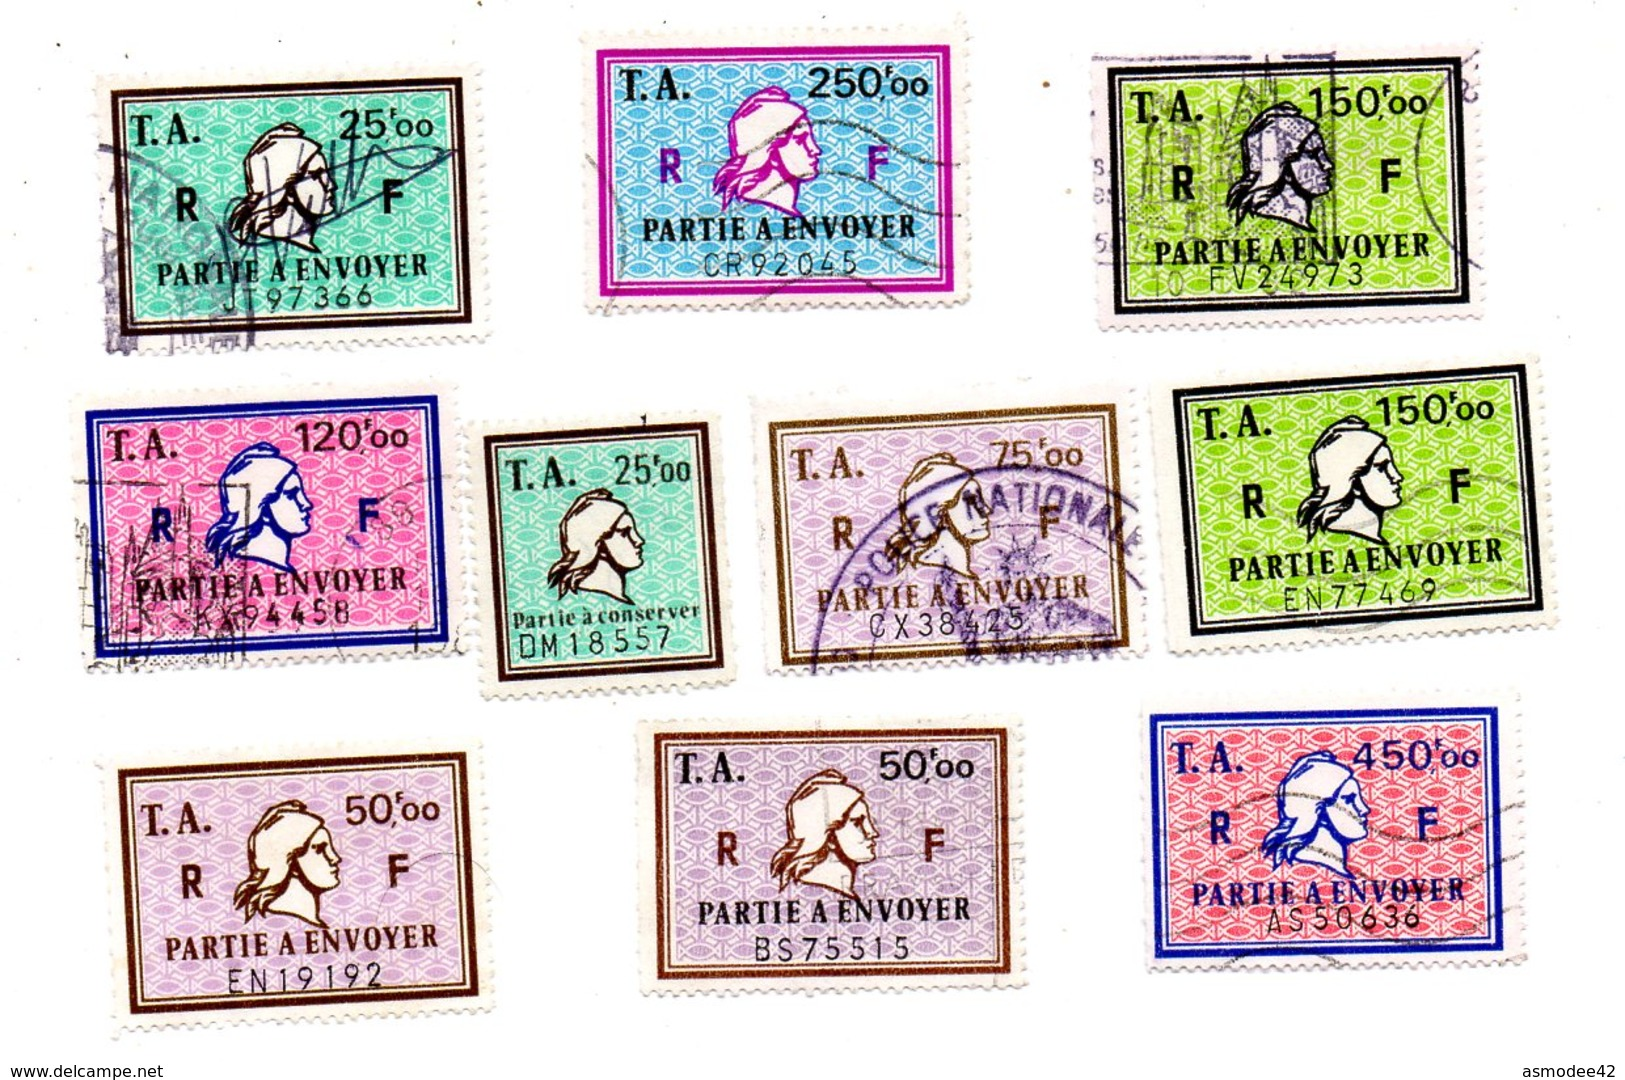 revenue stamps france timbres amendes lot de 10 timbres fiscaux h 21. Black Bedroom Furniture Sets. Home Design Ideas